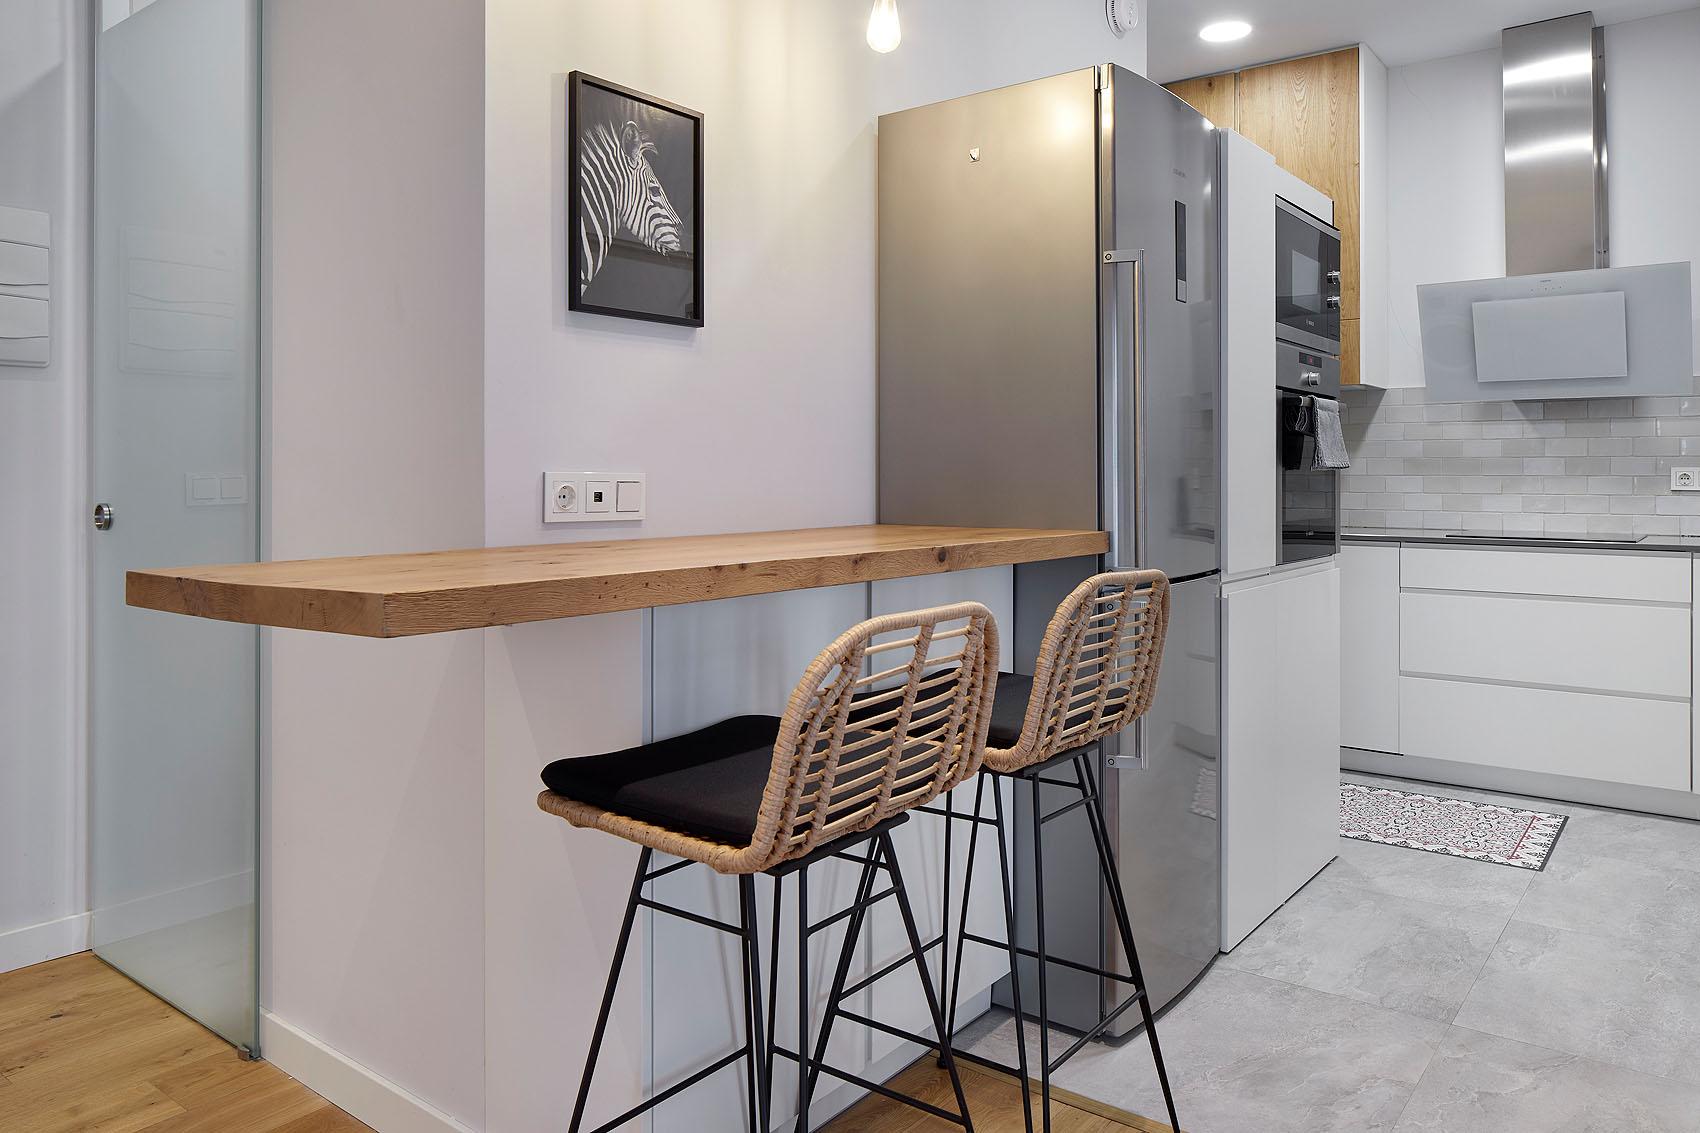 Apartamento en San Sebastian - Iñaki Caperochipi - Fotografía